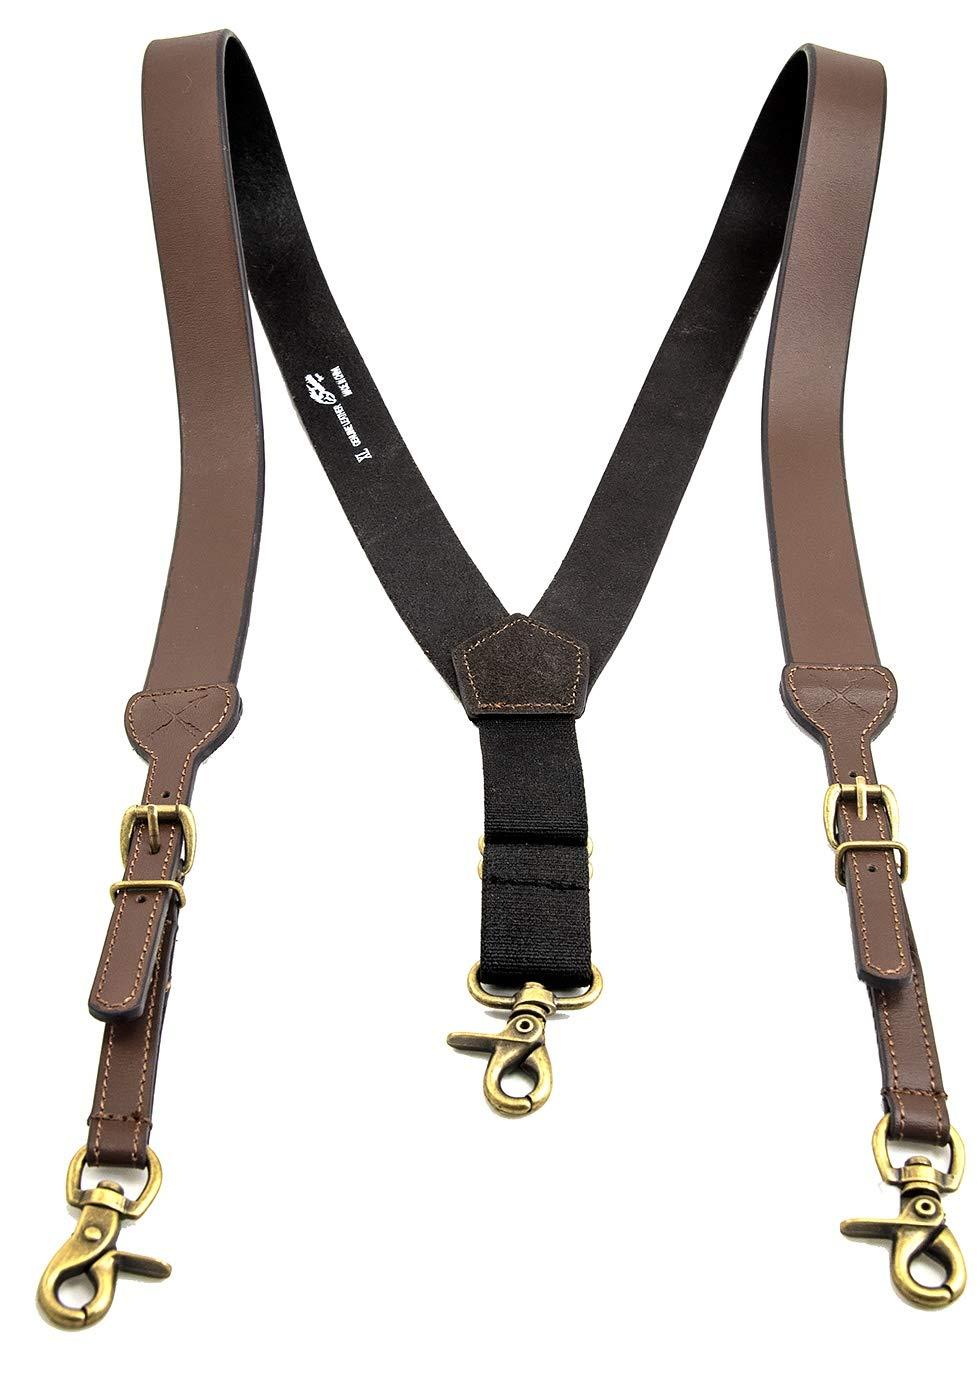 Men's Smooth Leather Suspenders Adjustable Elastic Strap Scissor Hook Snaps Y Backed (Brown, X-Large)